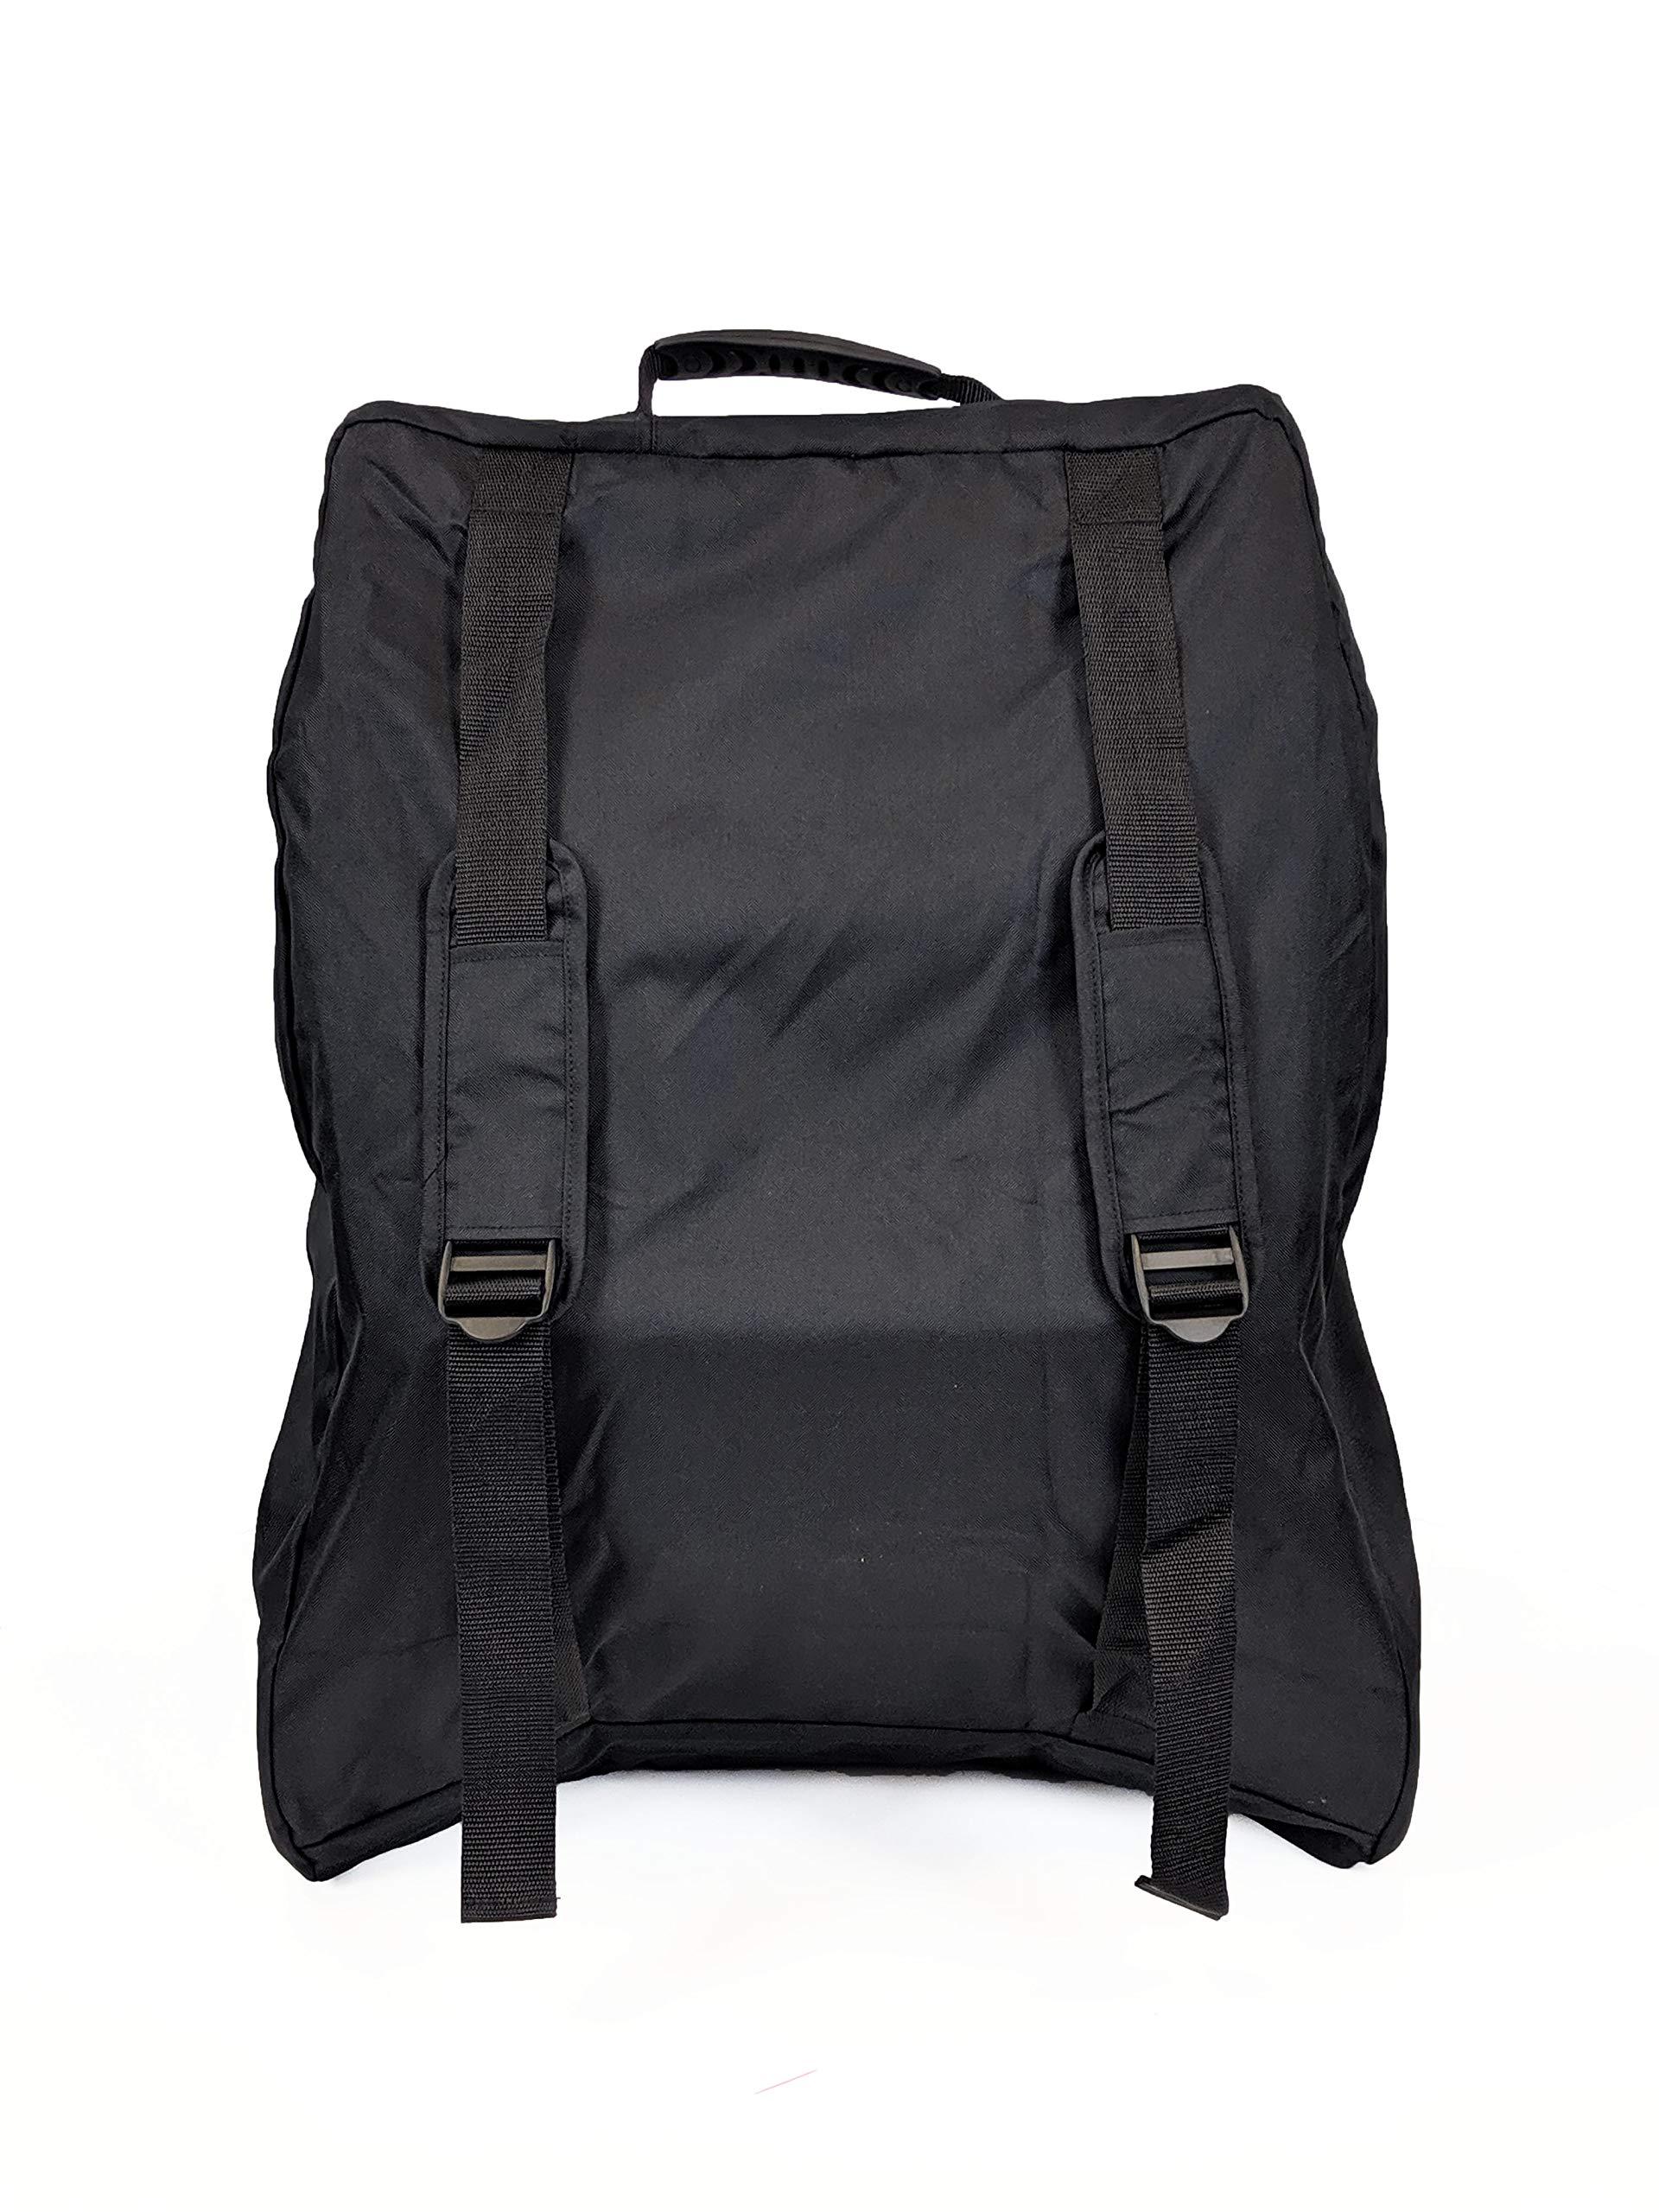 ZOE Stroller Travel Backpack & Storage Bag (XL1) by ZOE (Image #3)